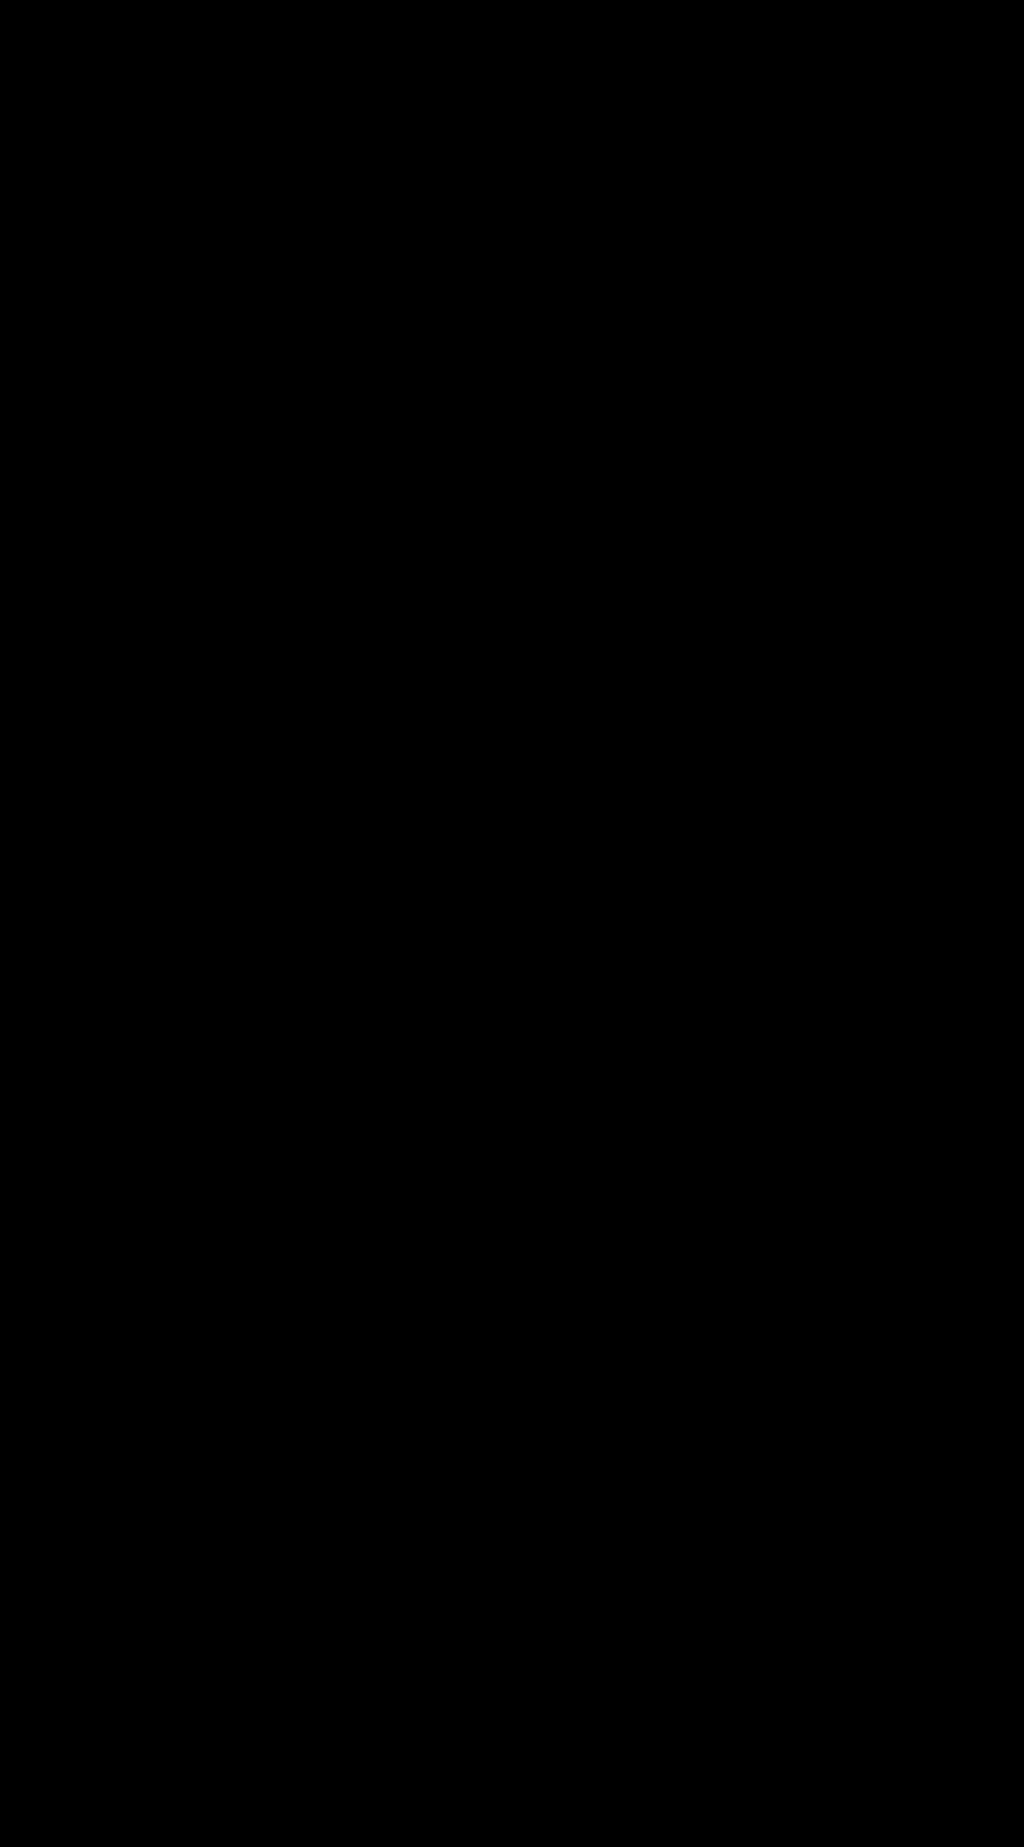 Line Art Layer : Free rgs joust ez layer lineart by daiguard on deviantart